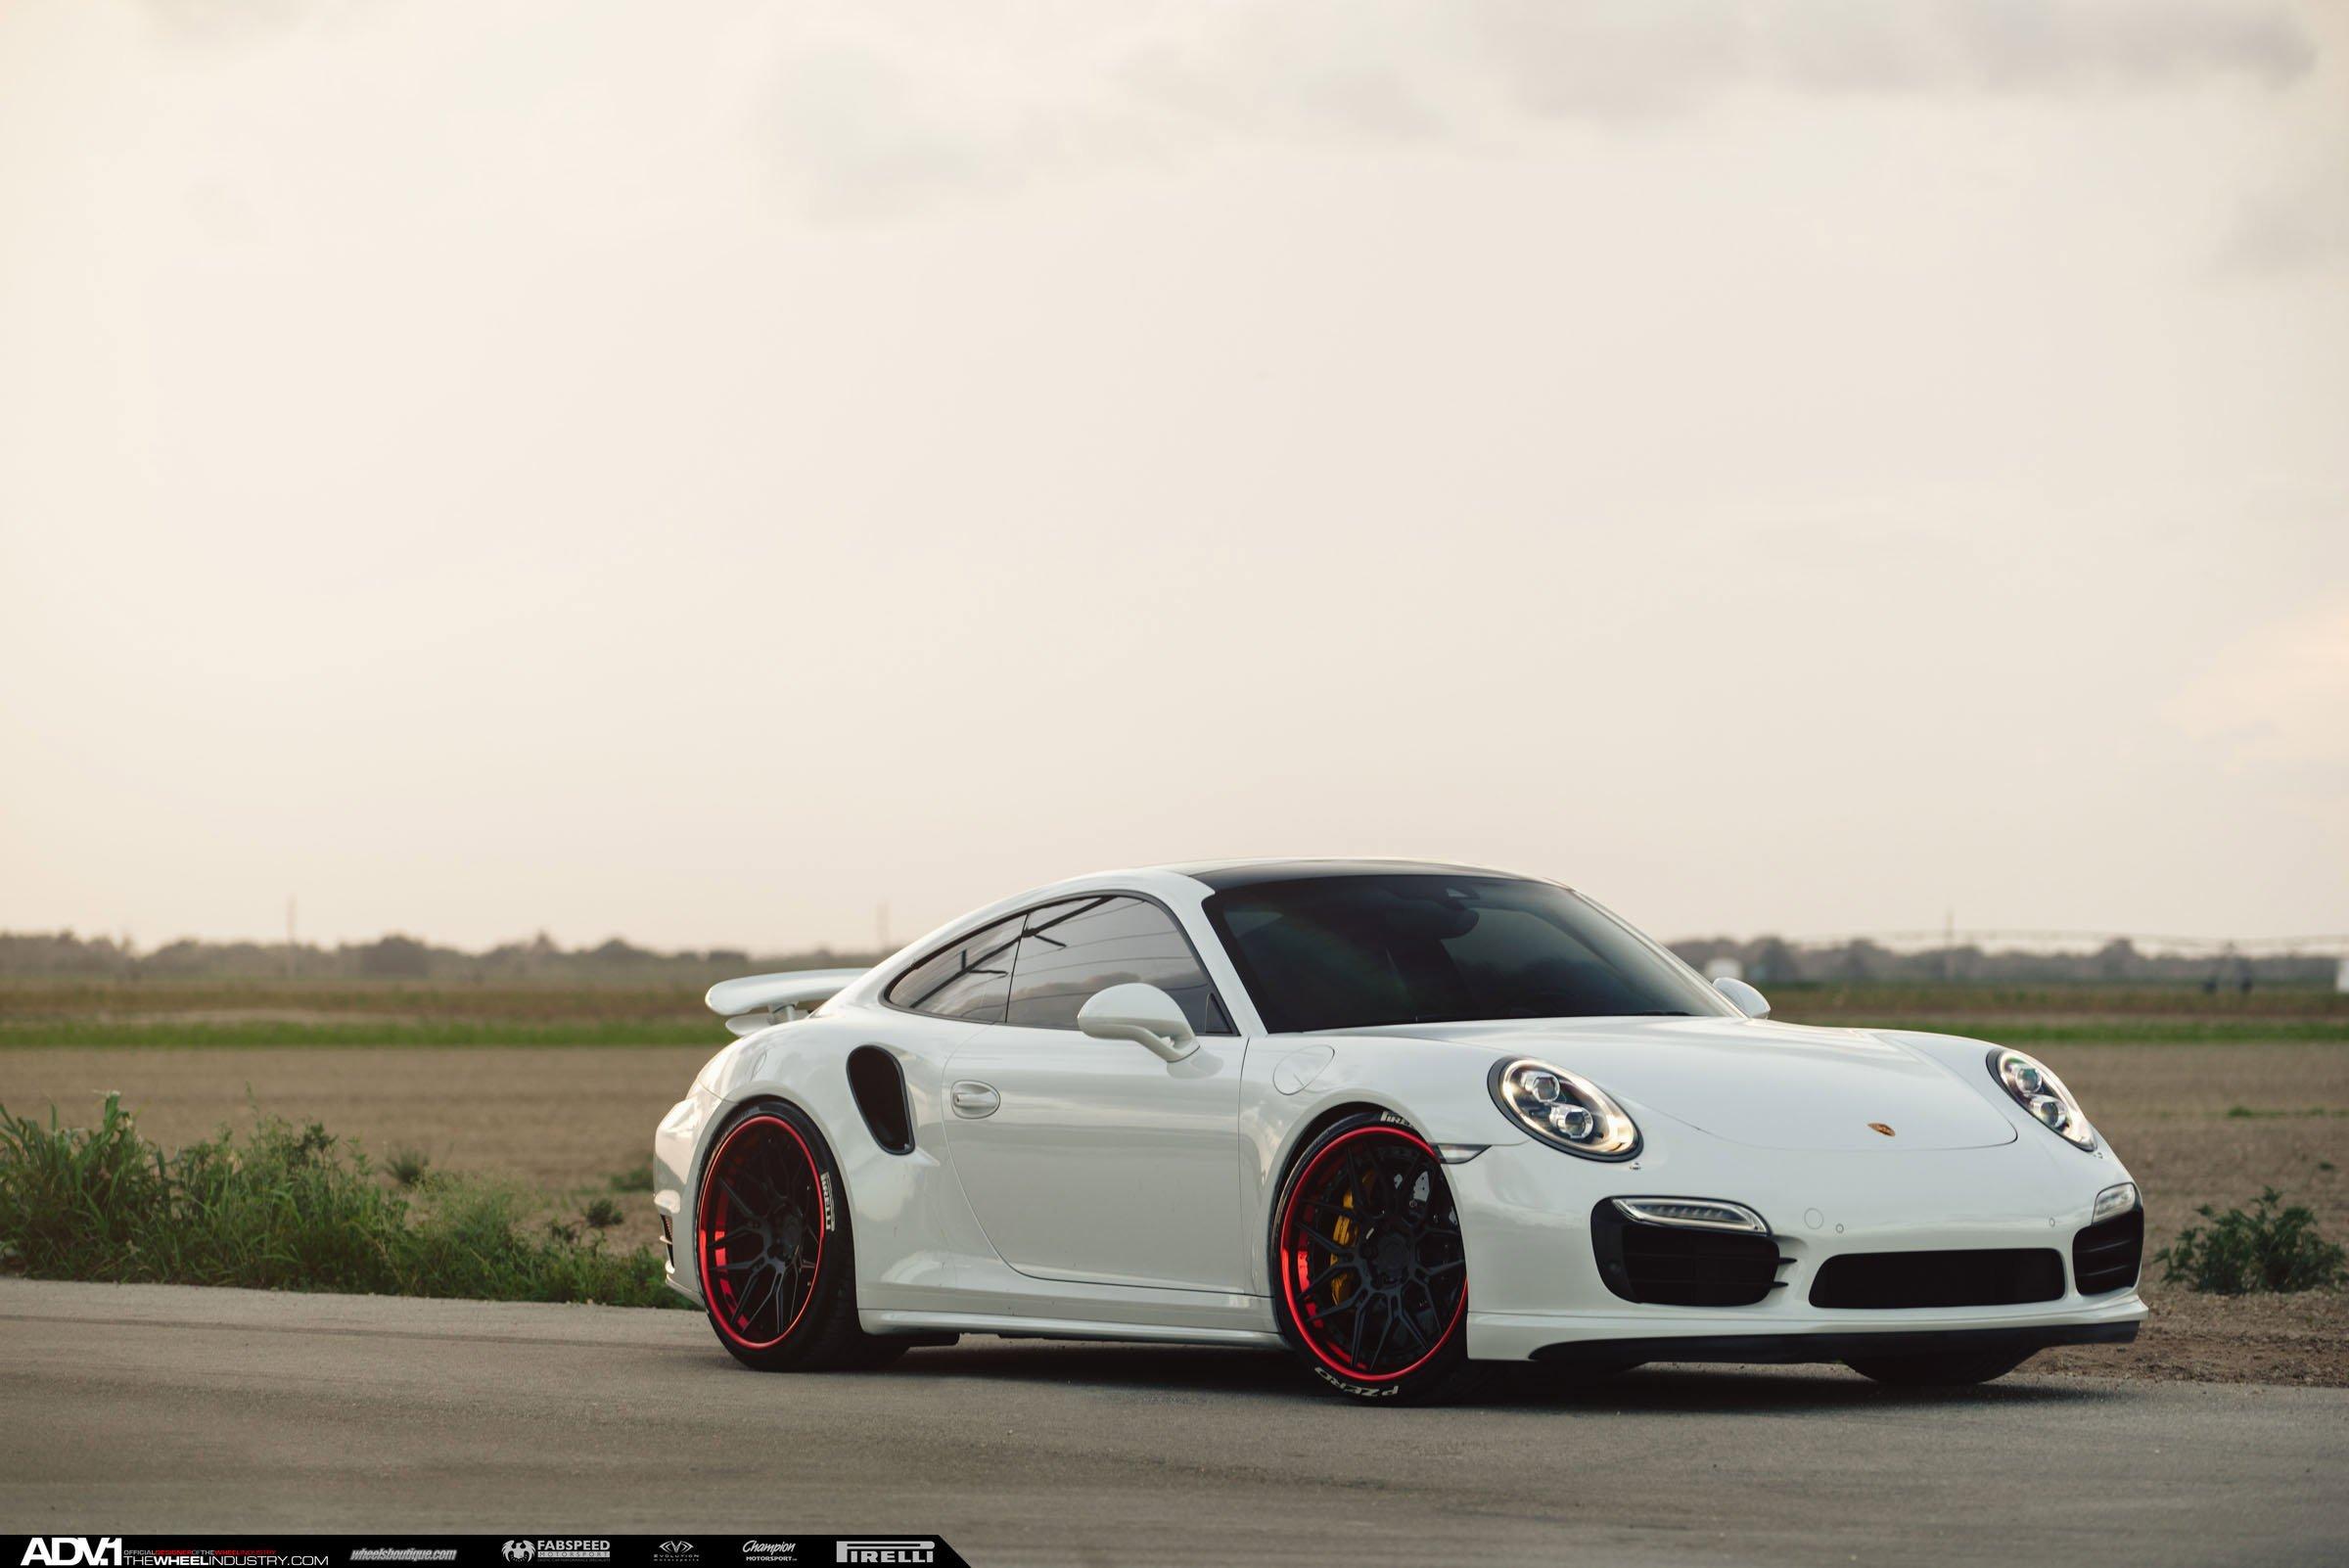 porsche turbo 2015 white wheels coupe cars tuning wallpaper wallpaperup sport kids - 911 Porsche 2015 White